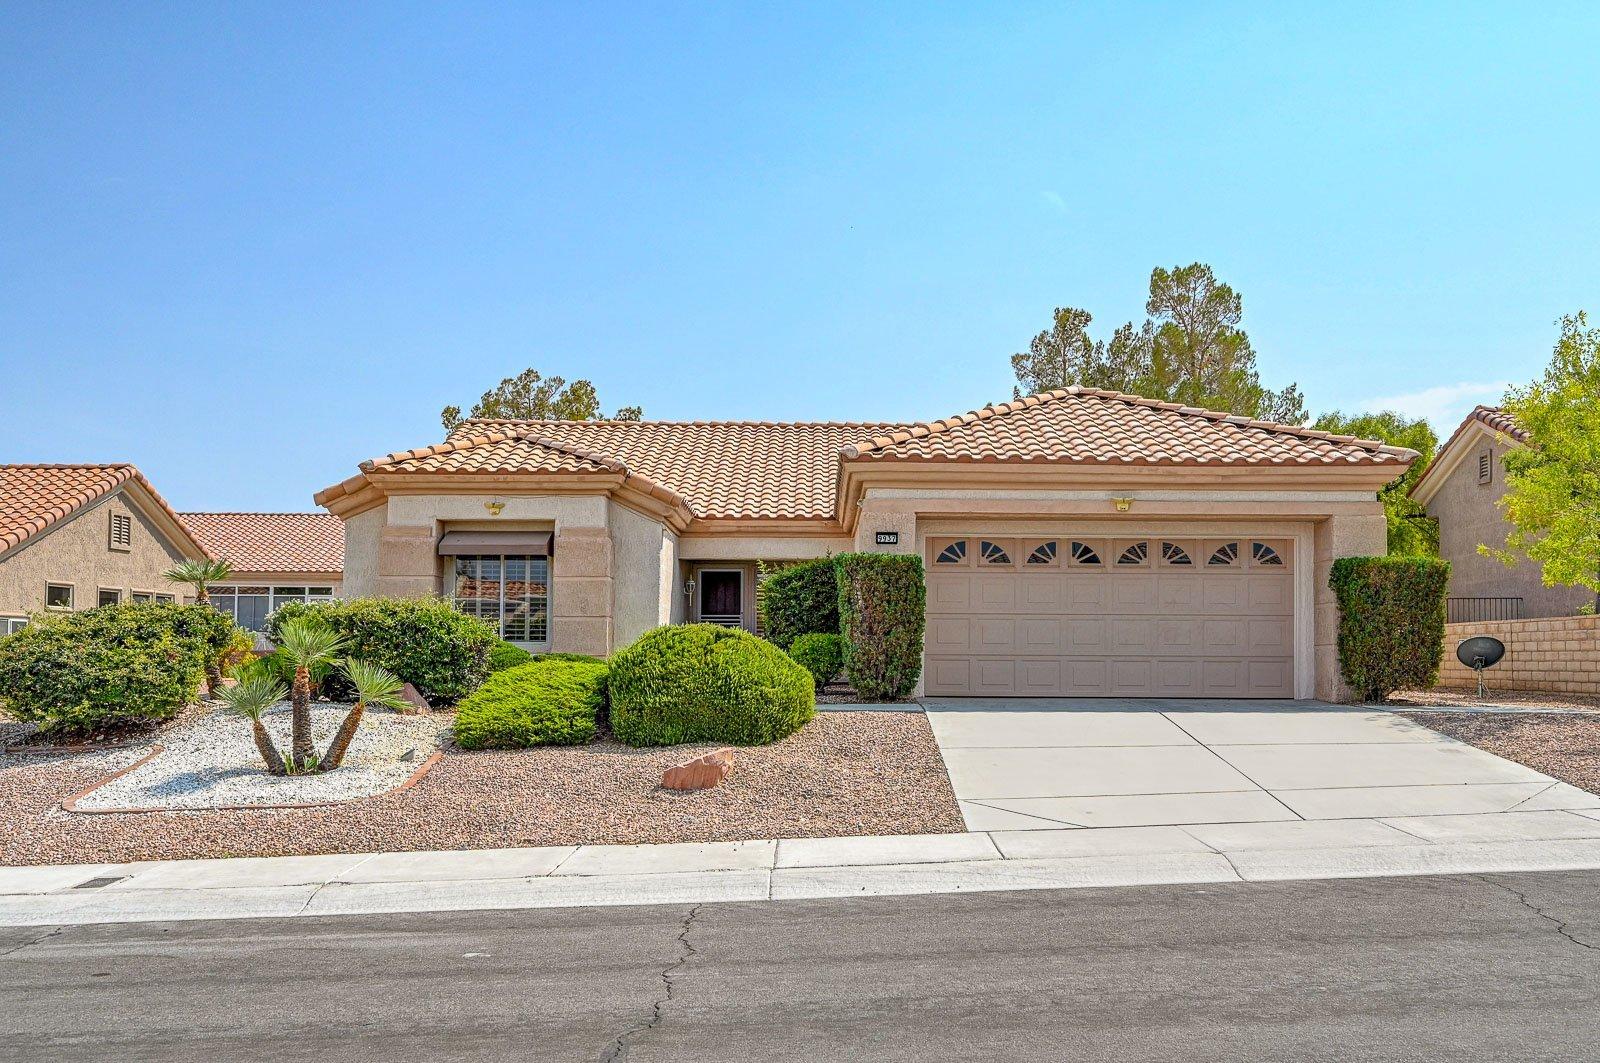 9937 Bundella Dr - 55+ Home for Sale Las Vegas